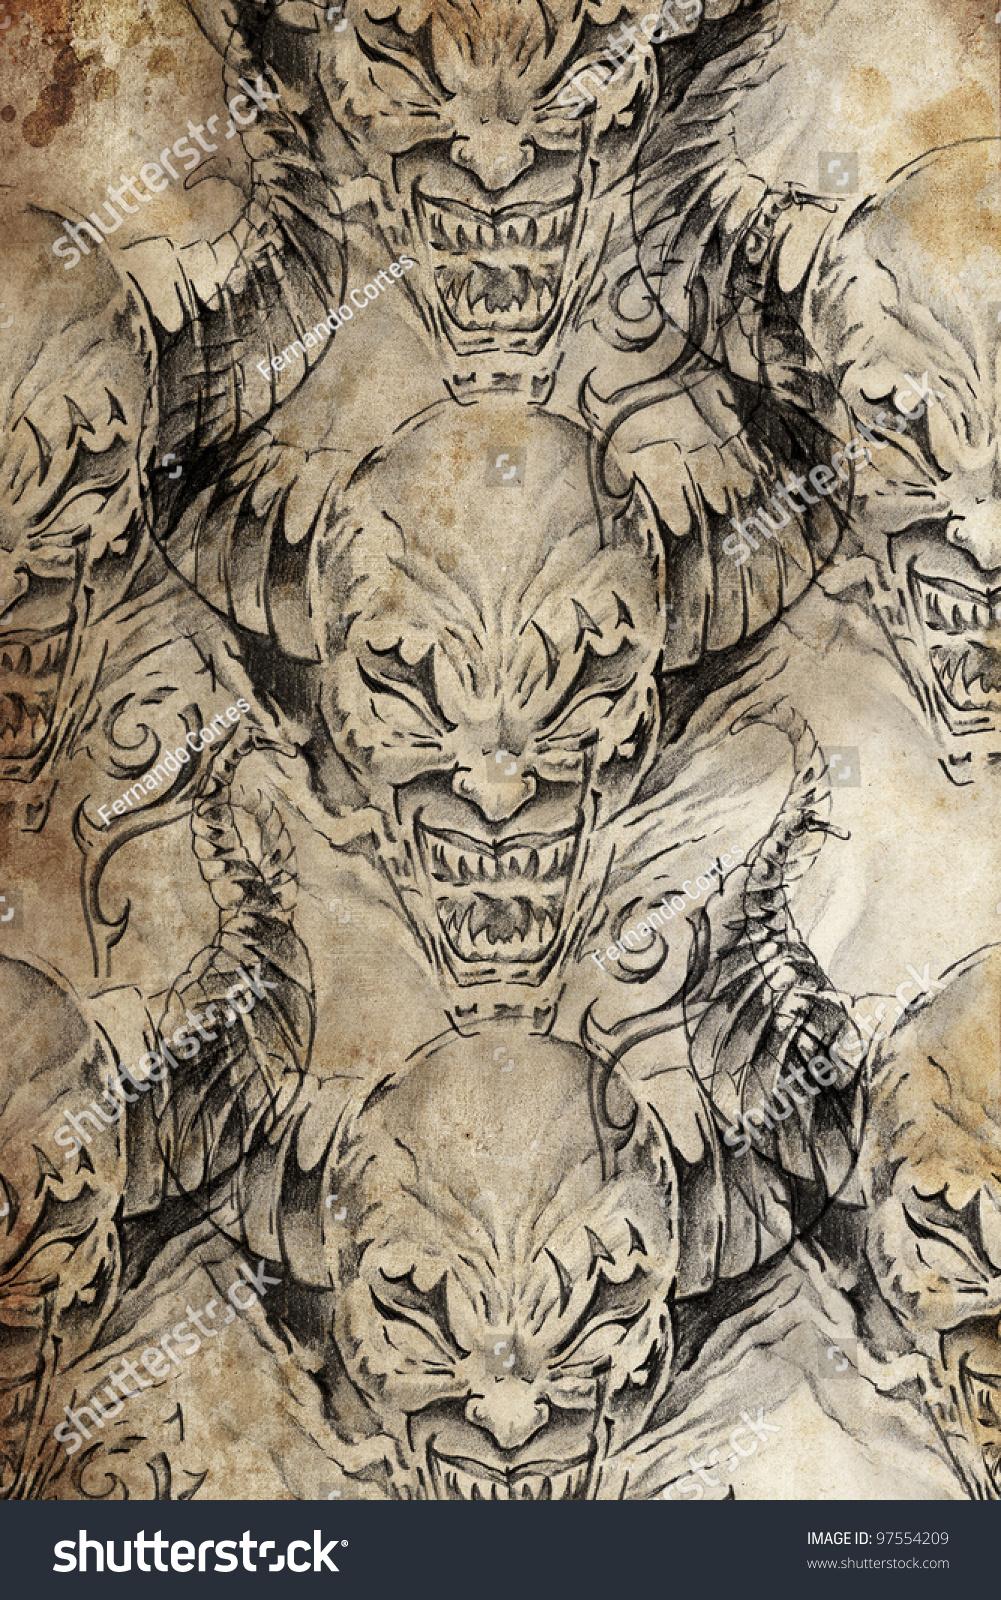 100 evil gargoyle tattoo designs photos gargoyles tattoo designs jpg evil looking. Black Bedroom Furniture Sets. Home Design Ideas